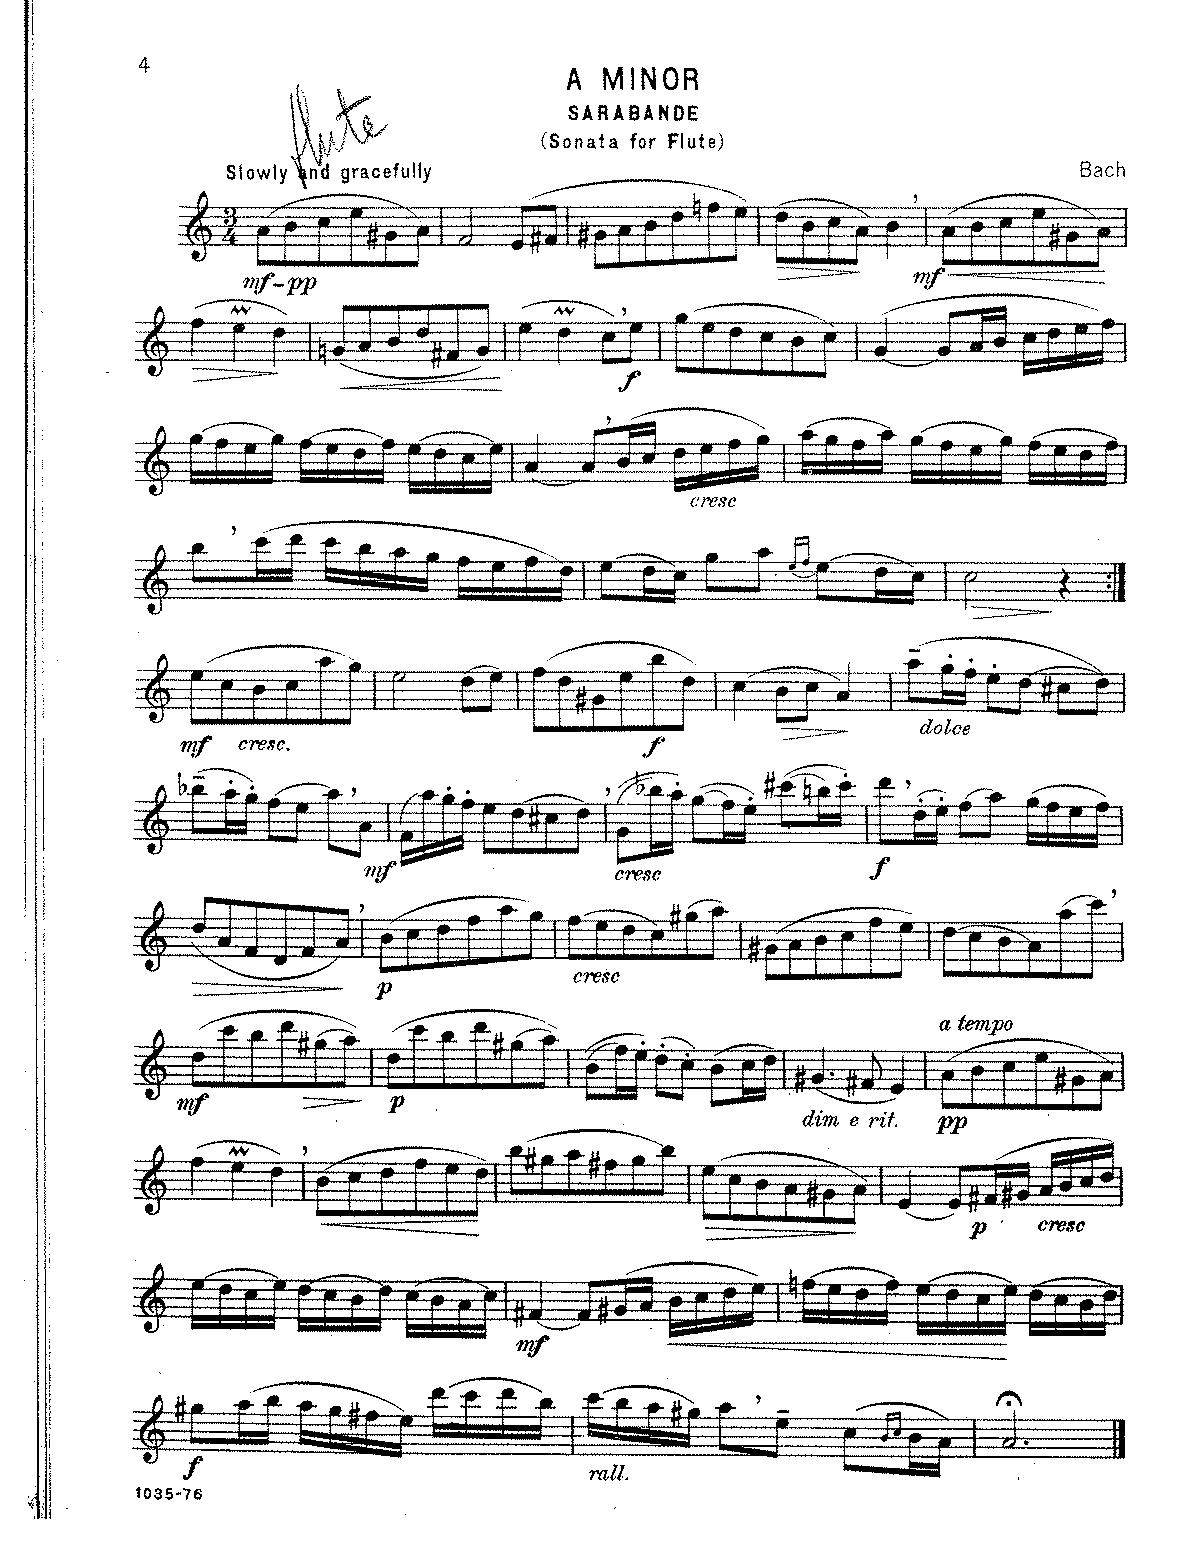 Johann Sebastian Bach Bach - Daniel Chorzempa - Die 6 Triosonaten BWV 525 - 530